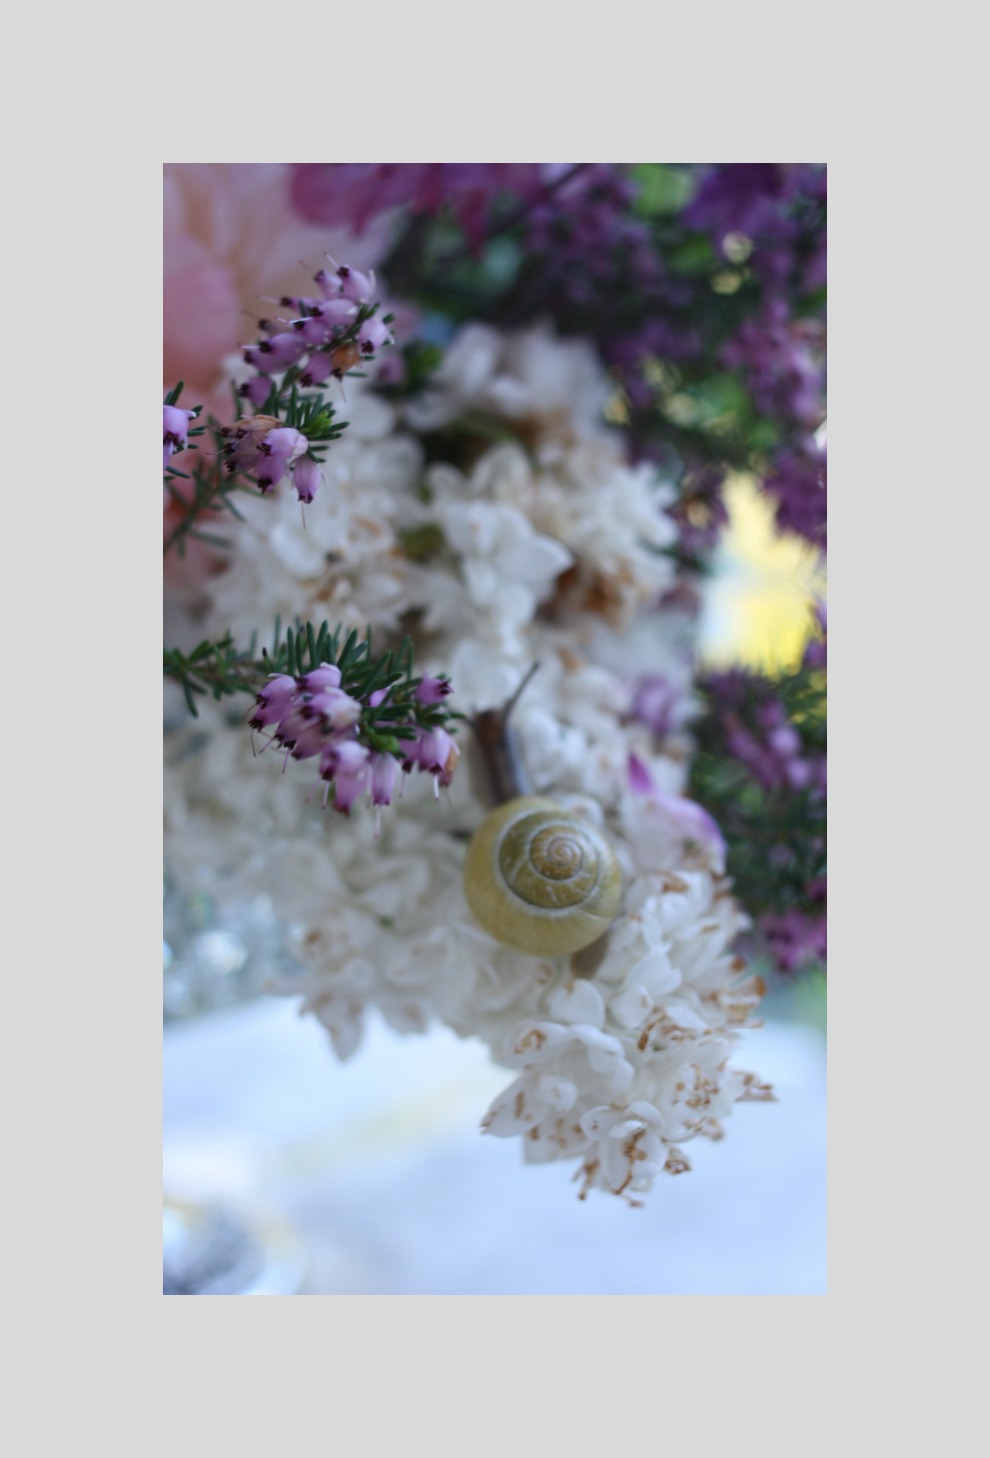 snail on lilac